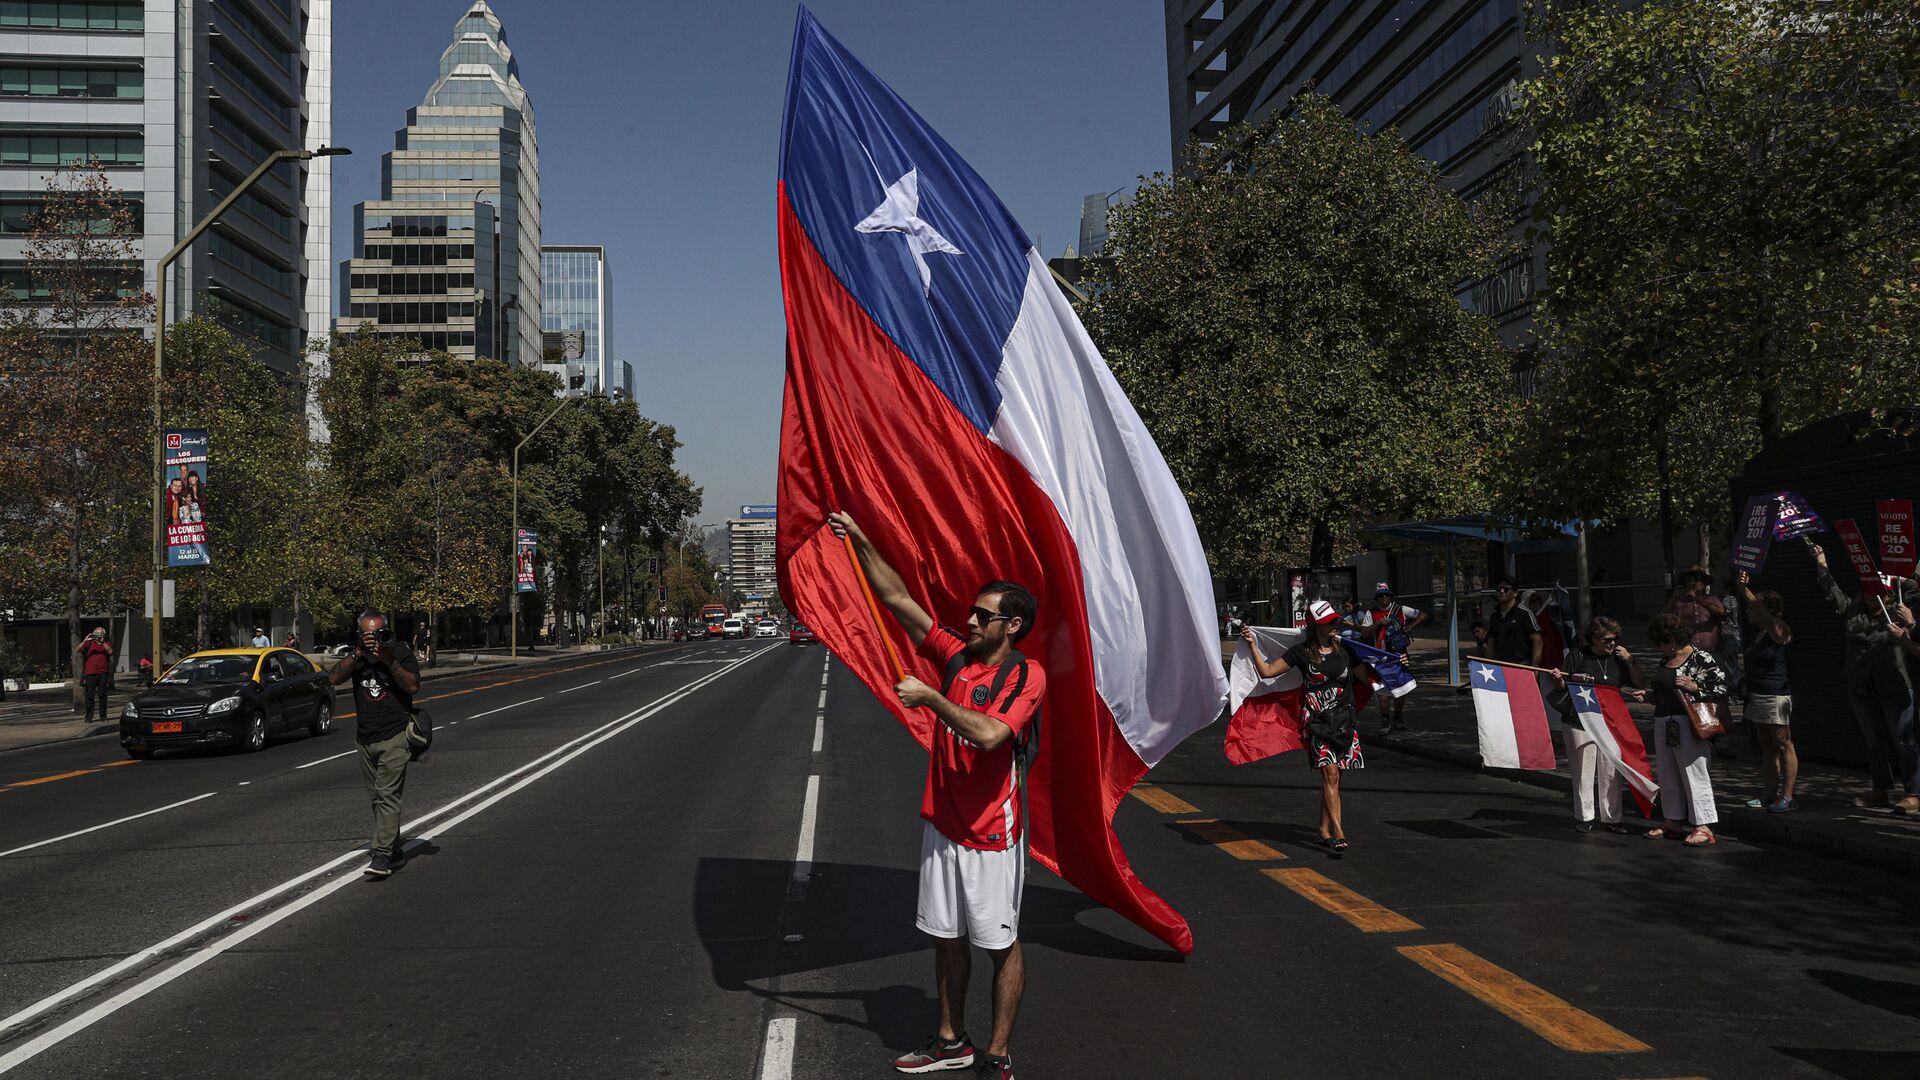 Un manifestante con la bandera de Chile - Sputnik Mundo, 1920, 13.10.2021